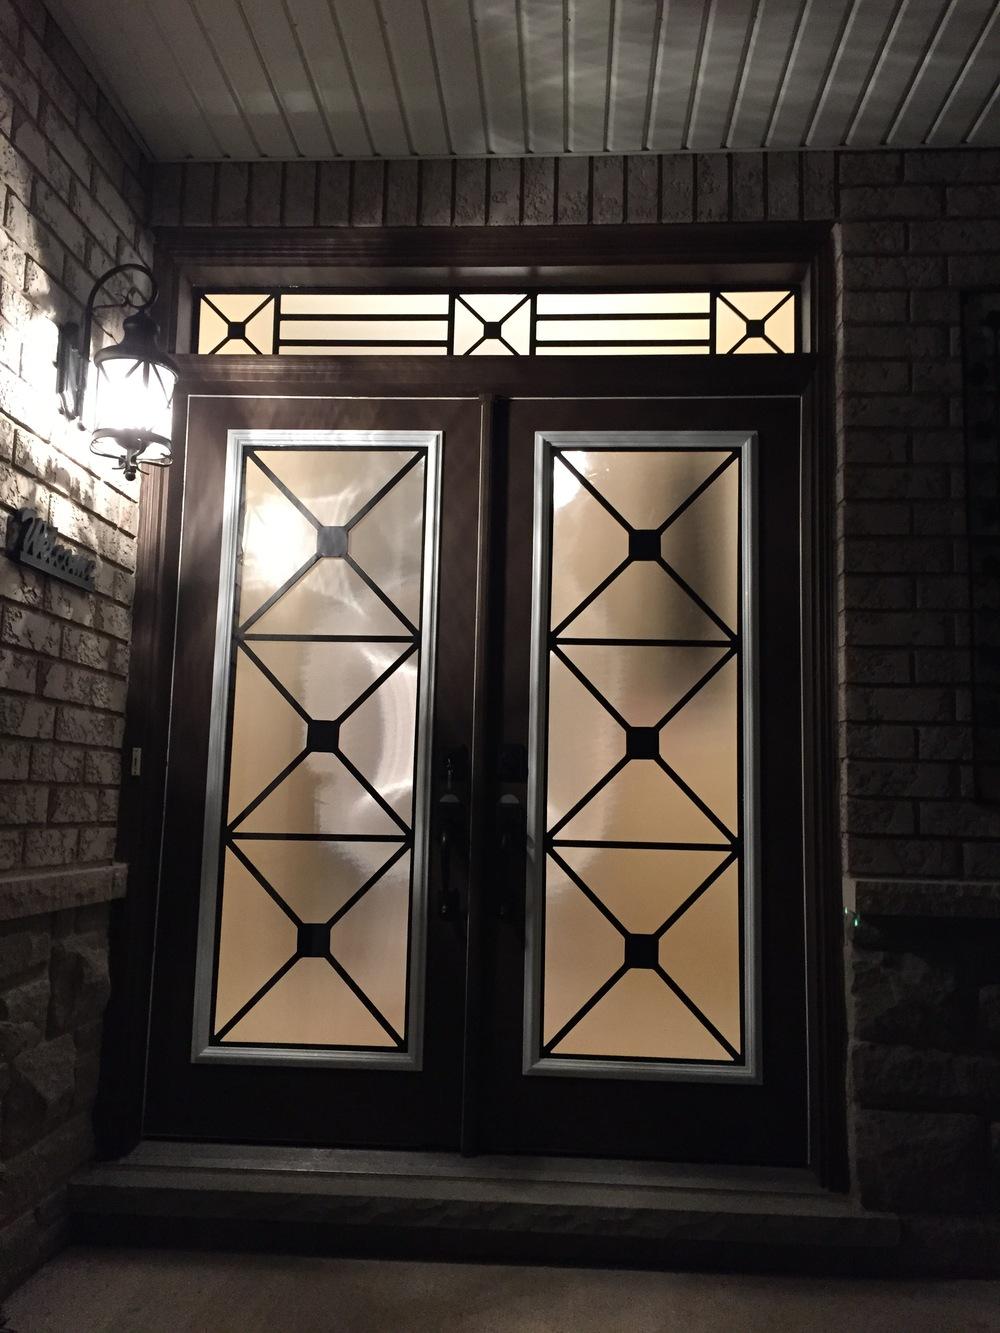 x-design-wrought-iron-glass-door-insert-installtion-bradford-on